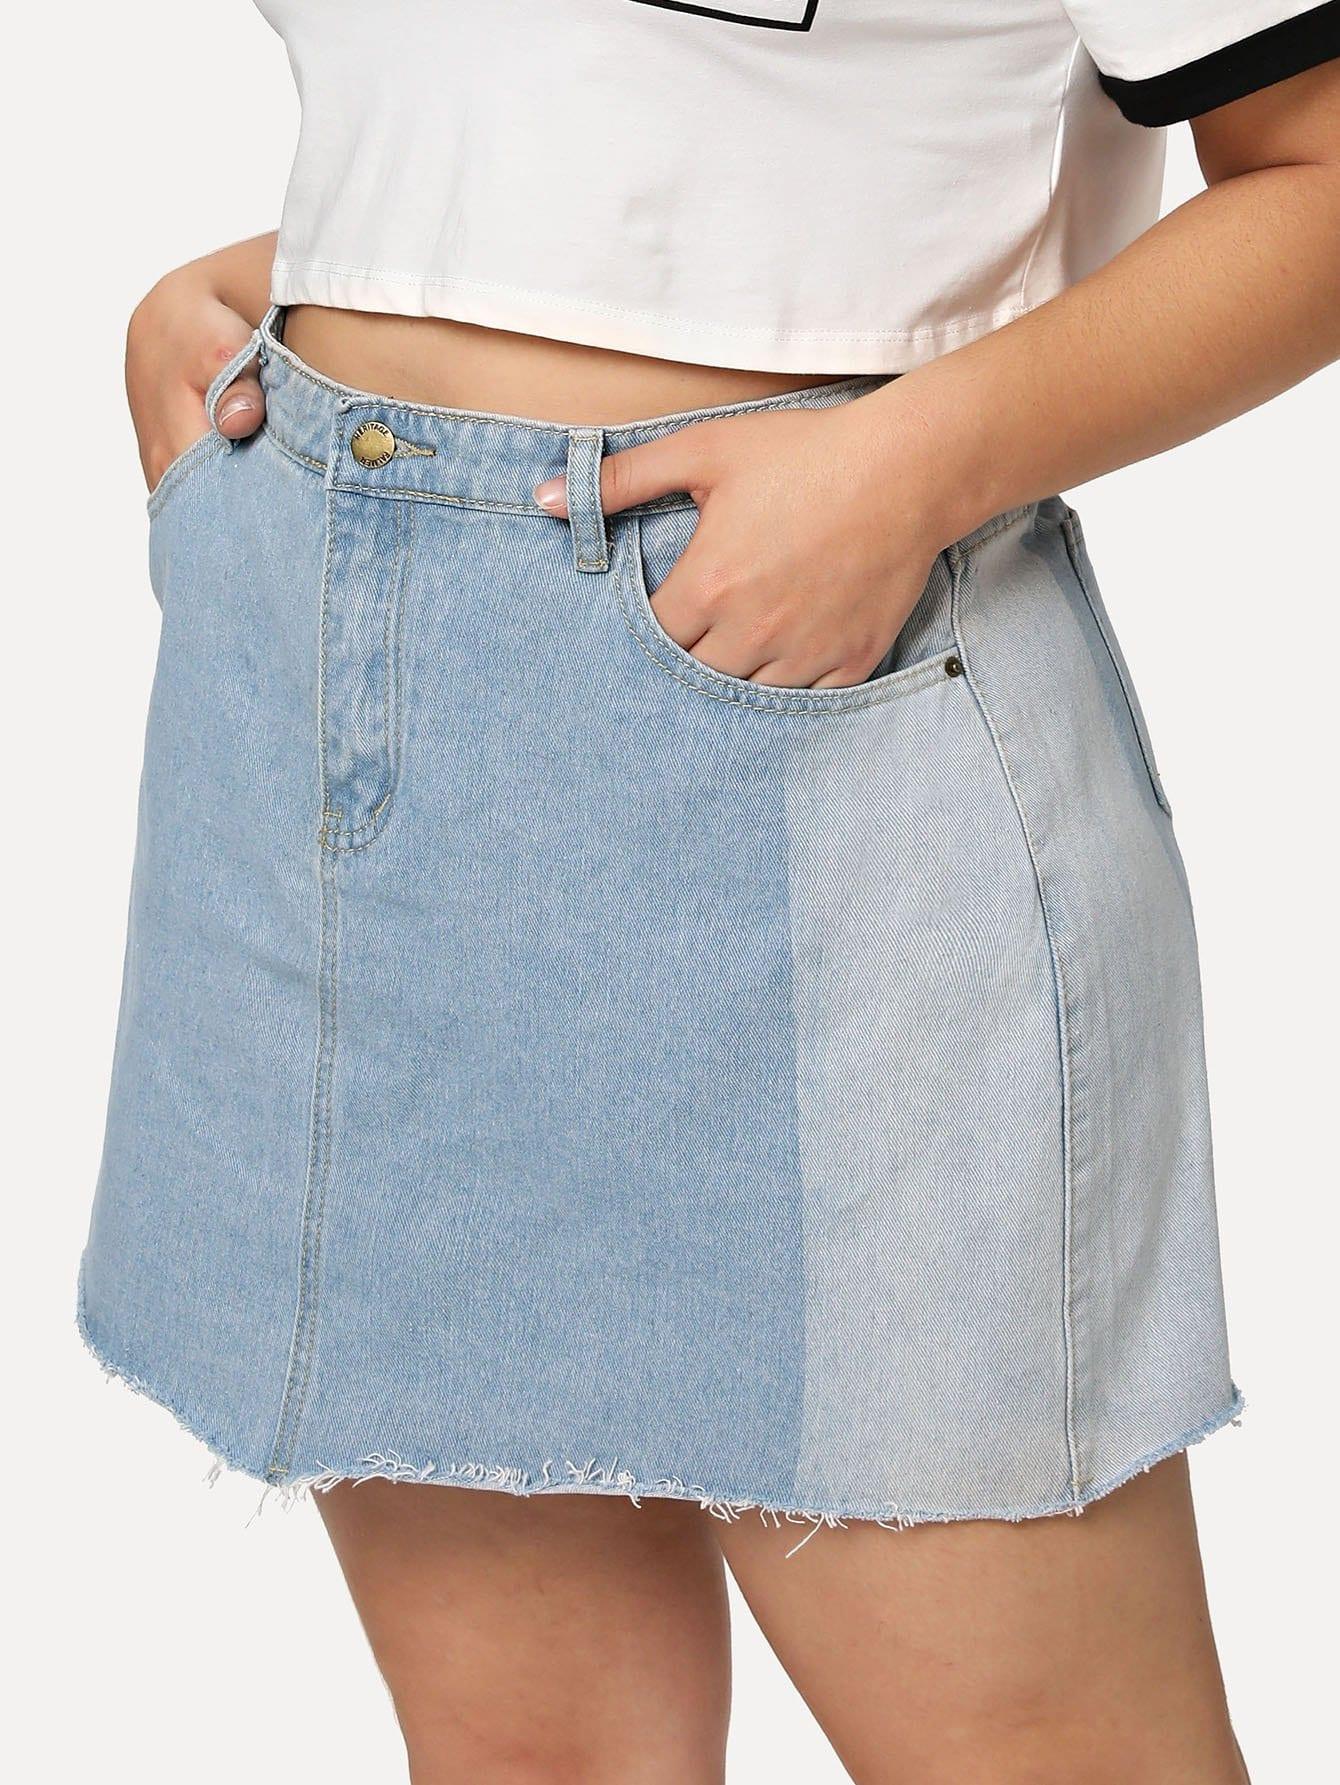 Two Tone Raw Hem Denim Skirt girls single breasted raw hem skirt